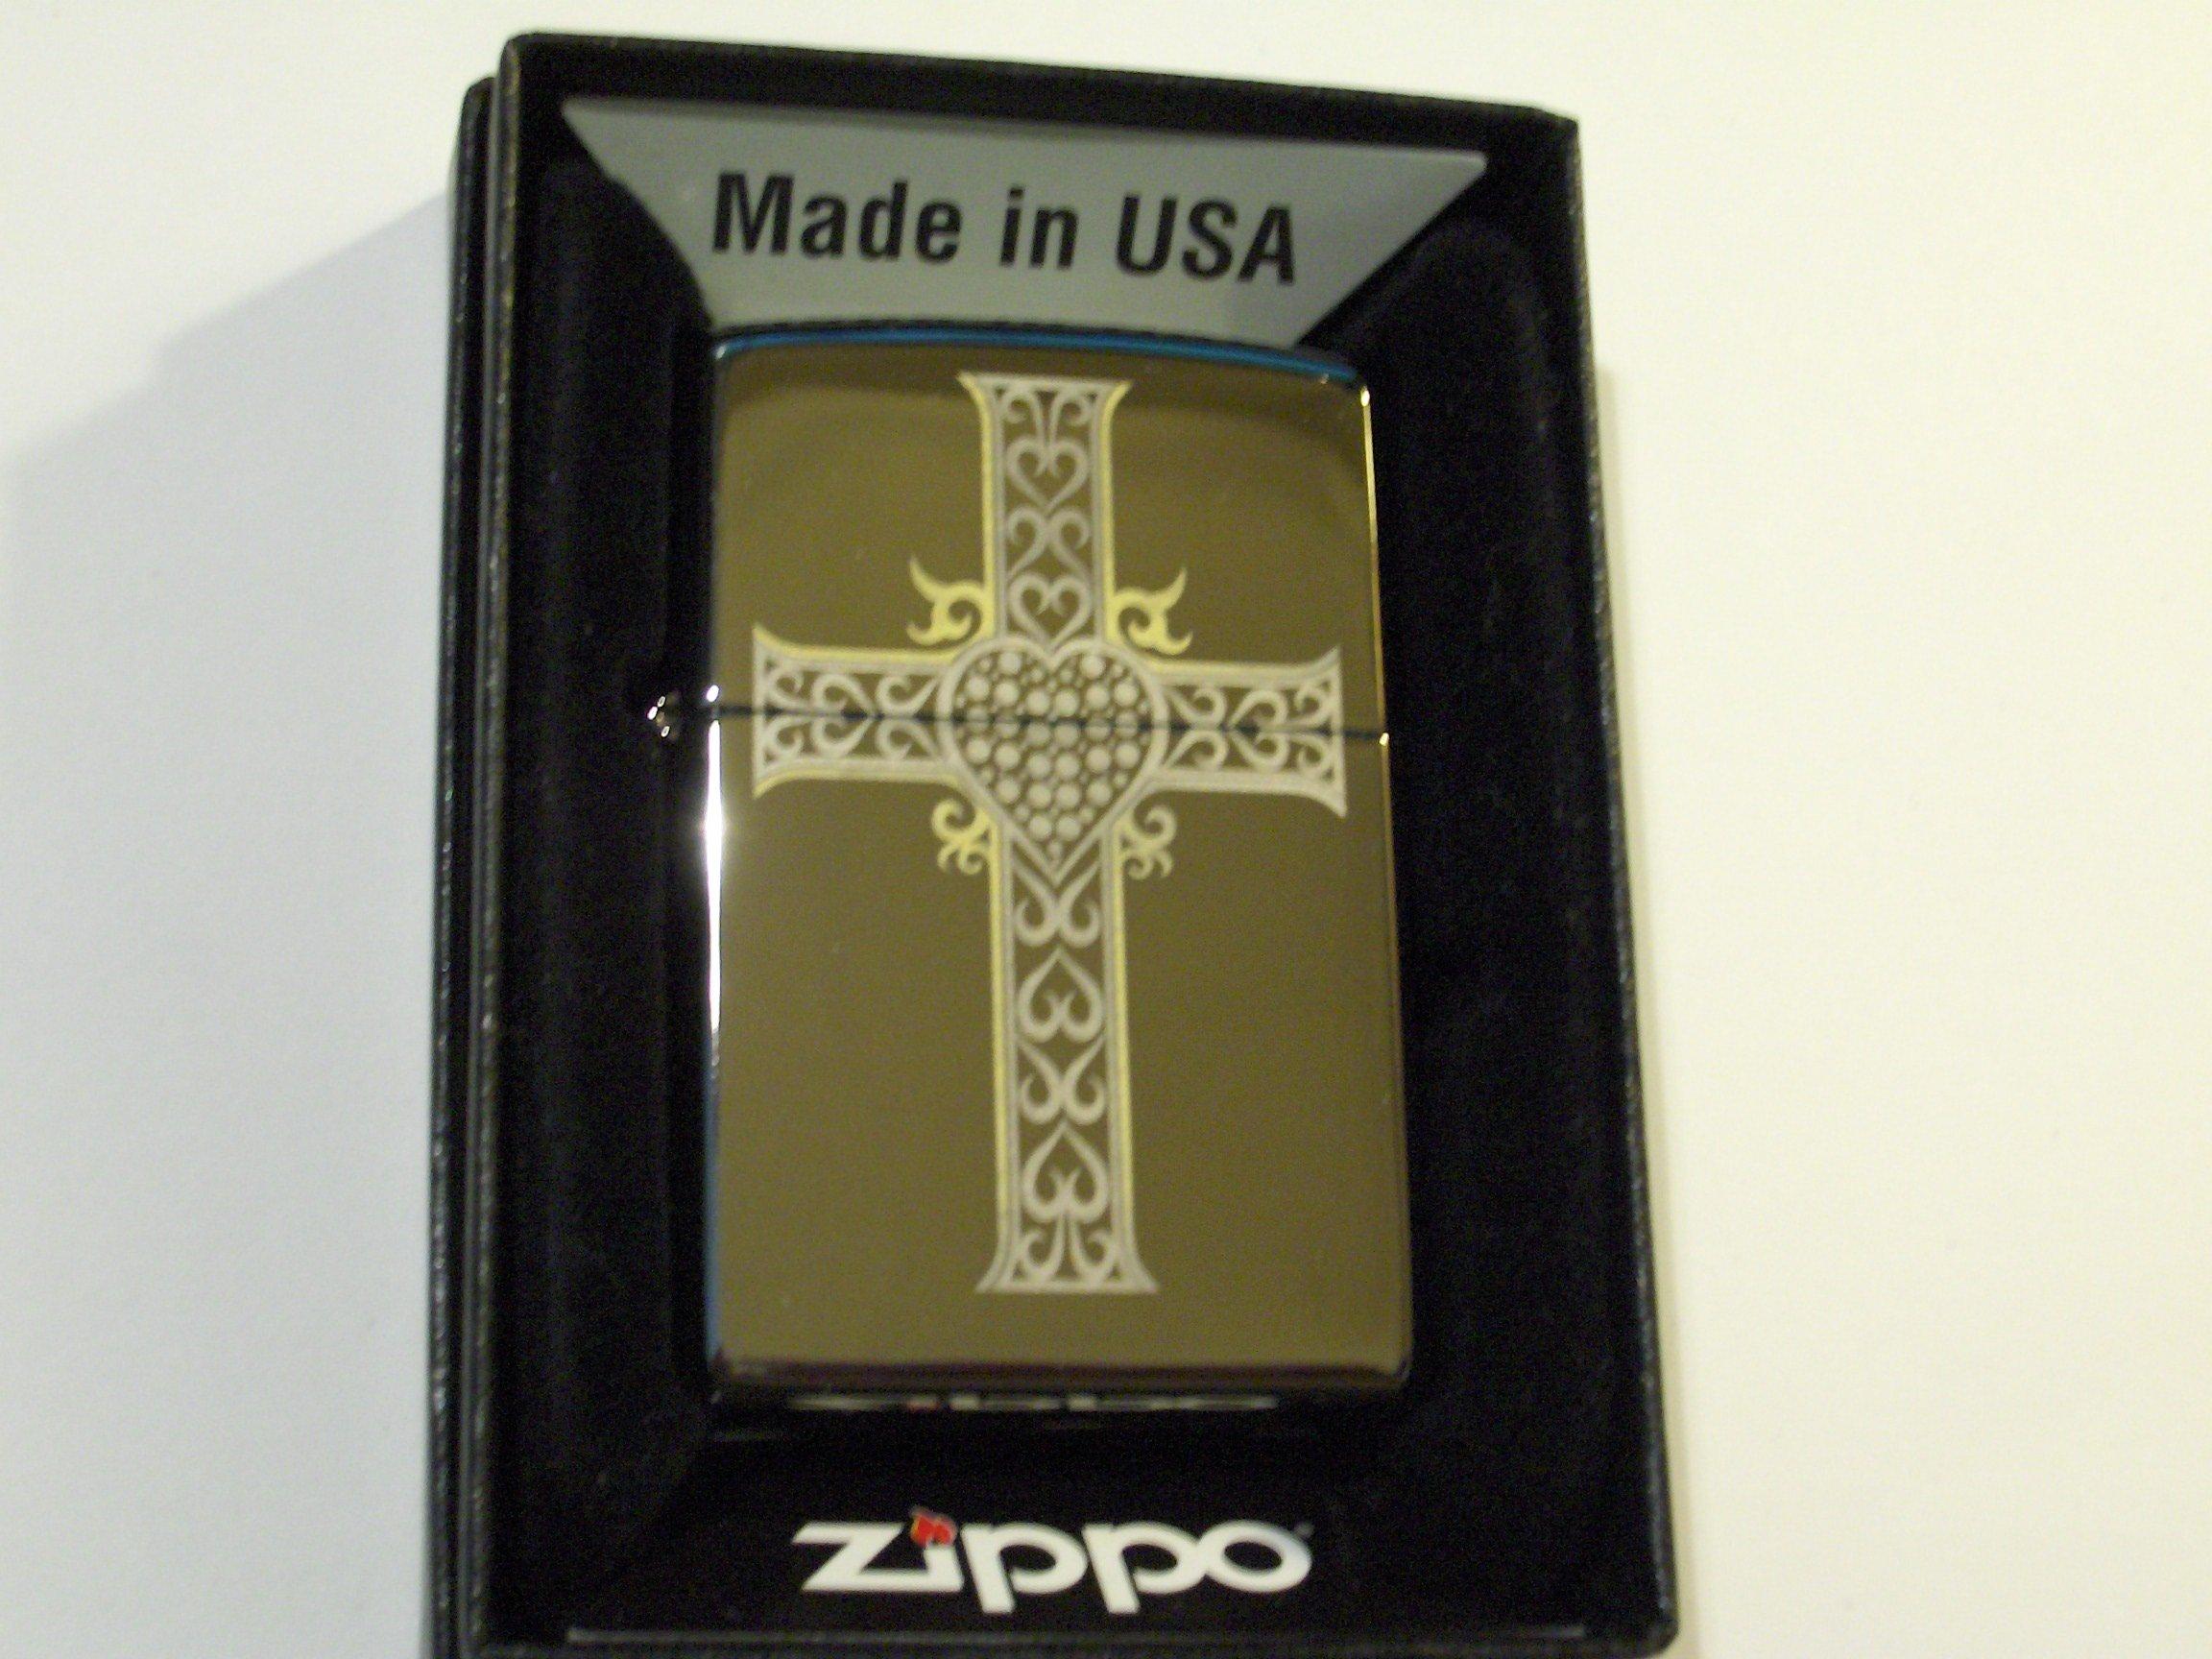 Zippo Lighter – Jewelry Heart & Cross Black Ice